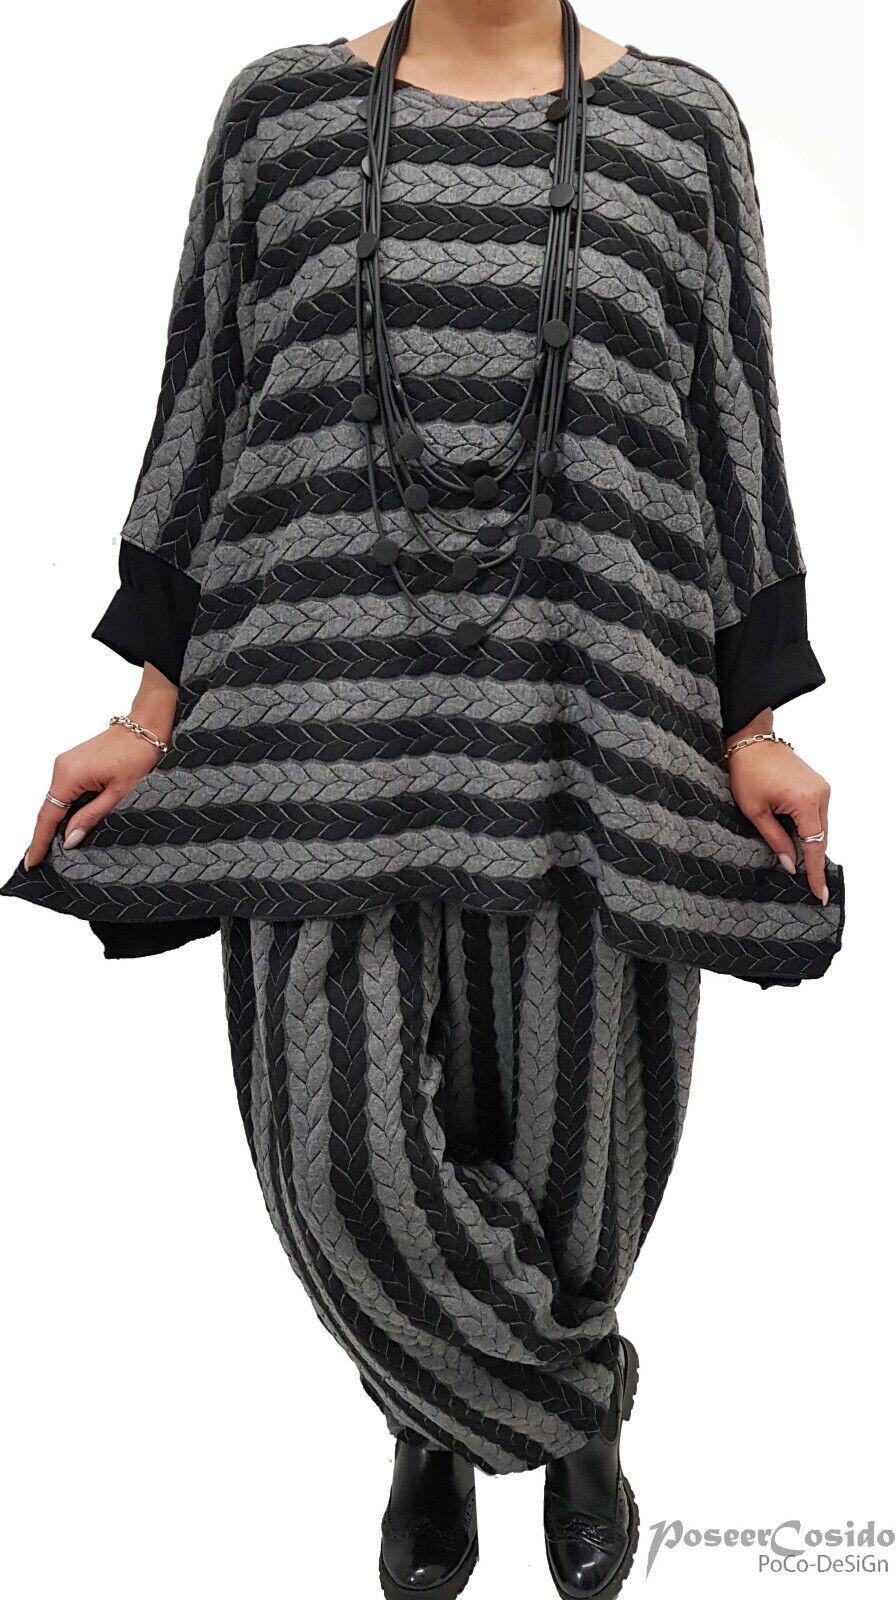 PoCo DeSiGn LAGENLOOK Pullover Pulli Long-Shirt schwarz grau Zopf L-XL-XXL-XXXL